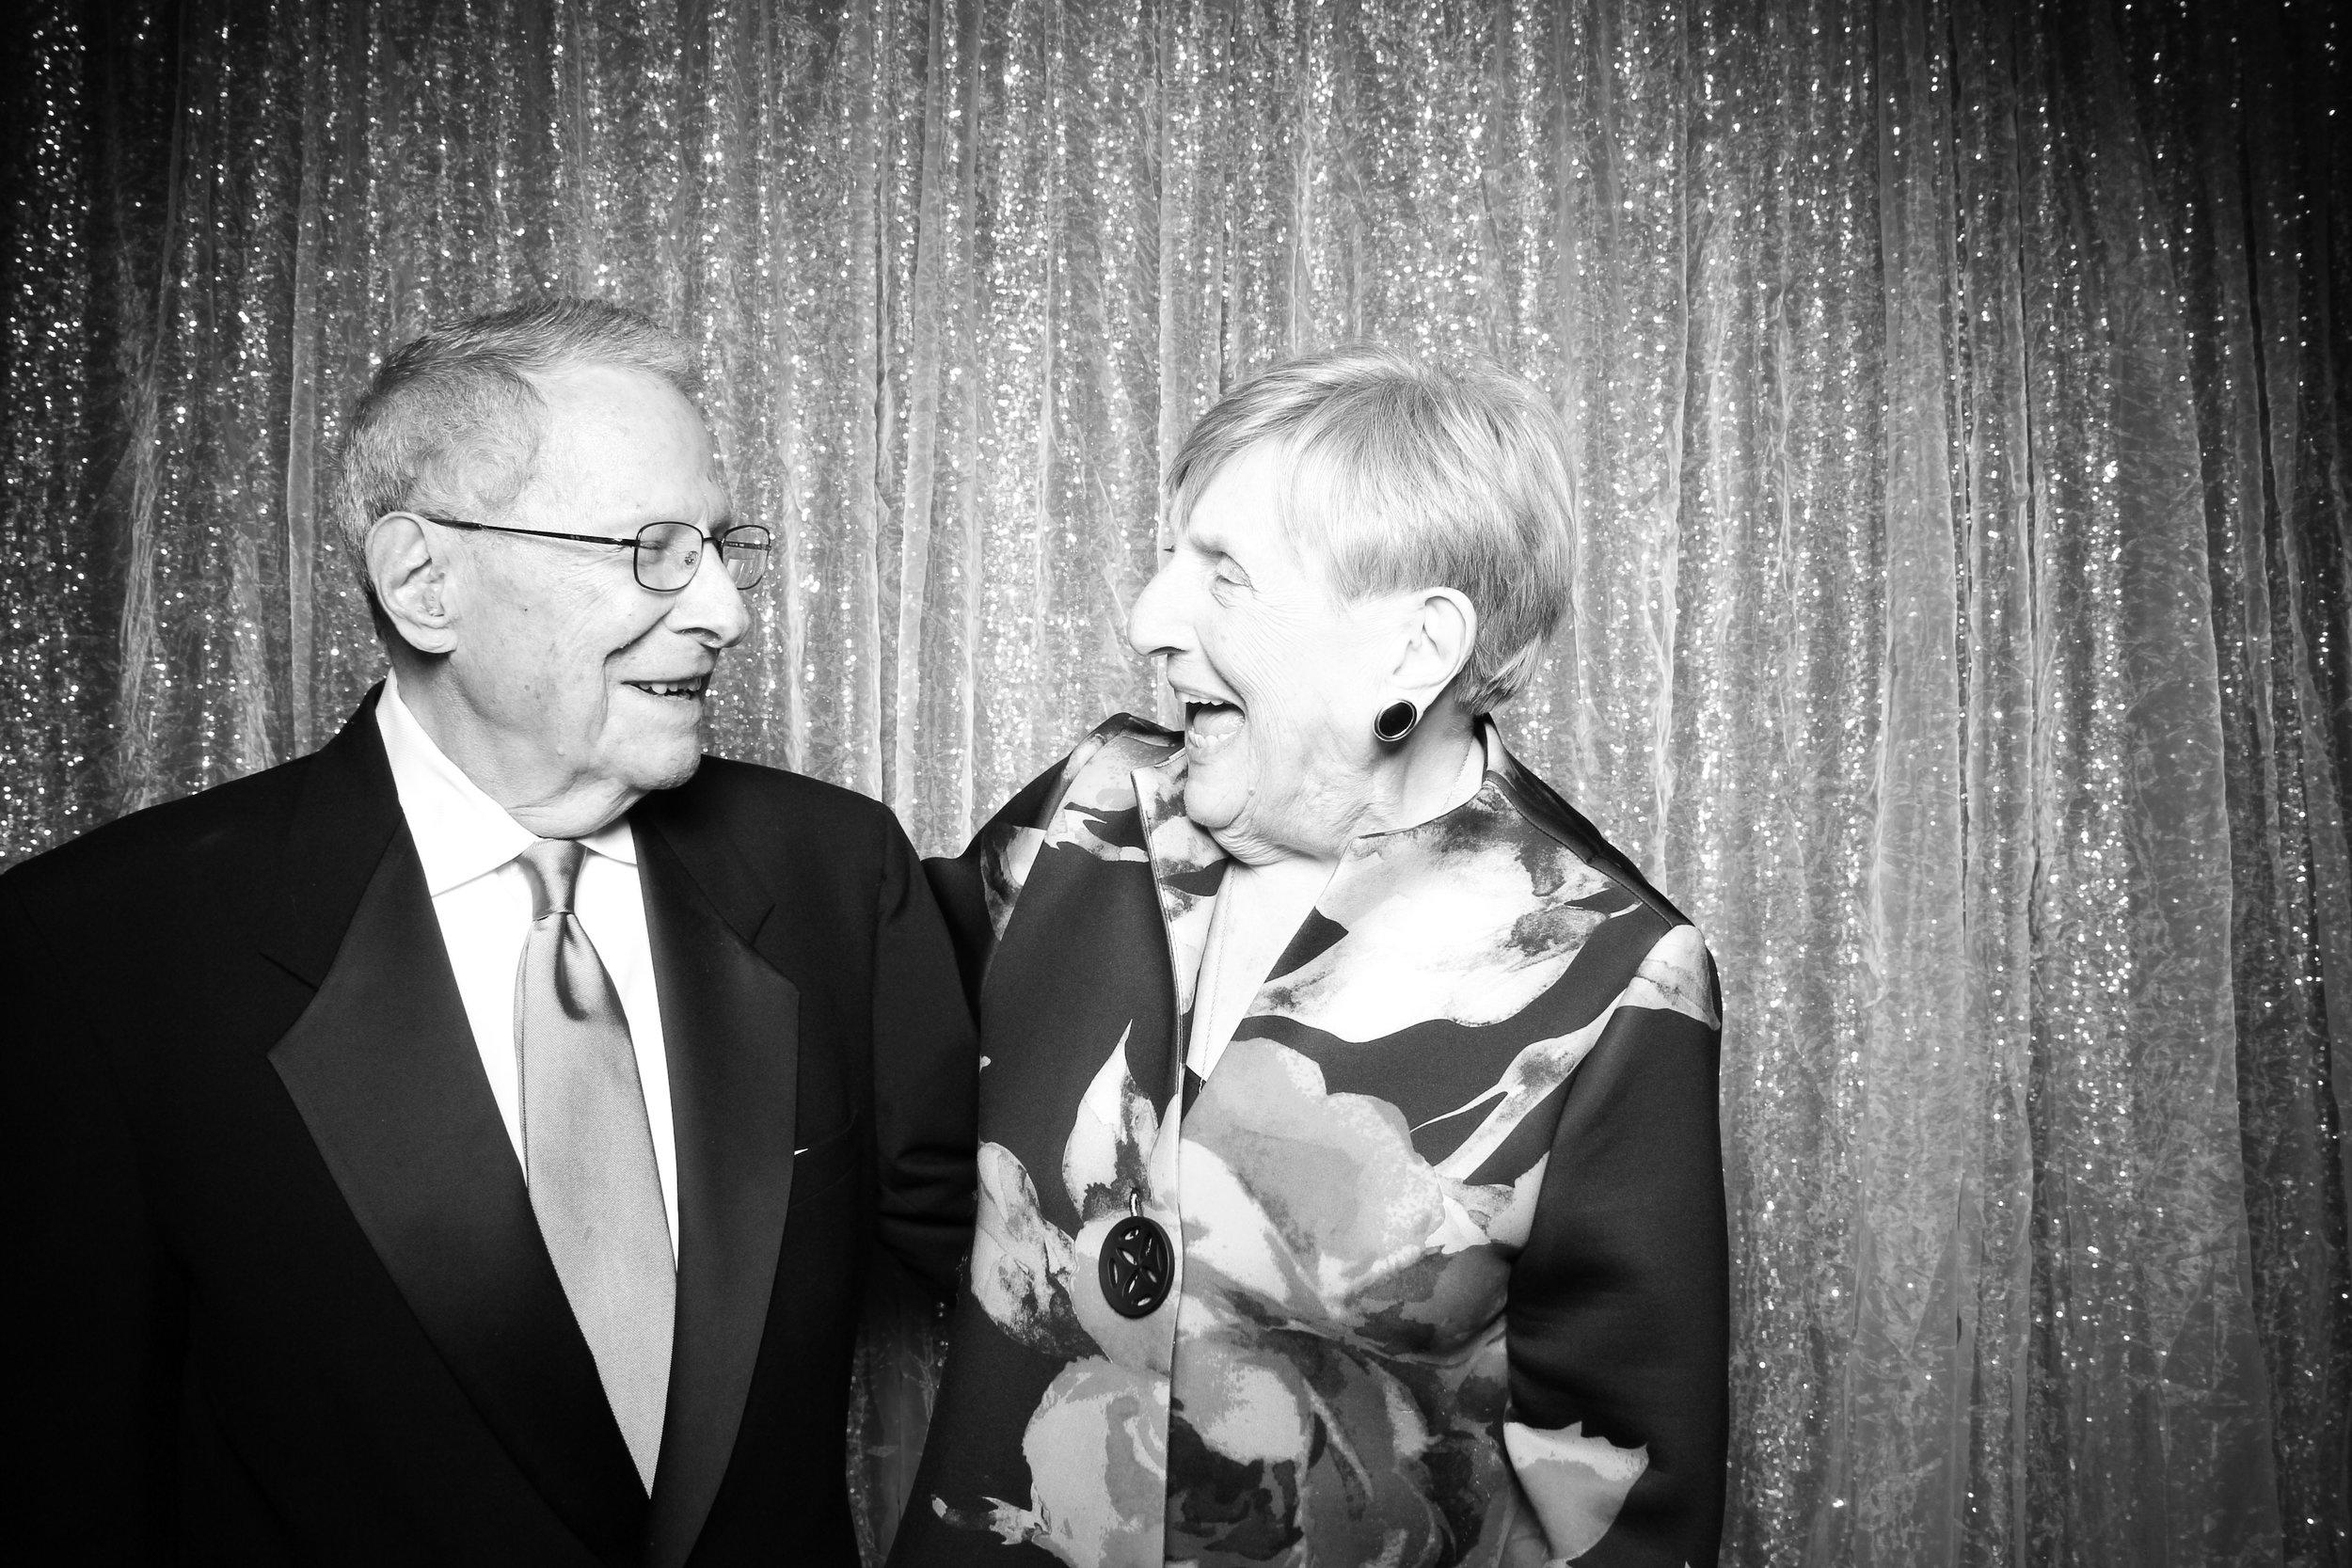 JW_Marriott_Burnham_Ballroom_Wedding_Photo_Booth_15.jpg